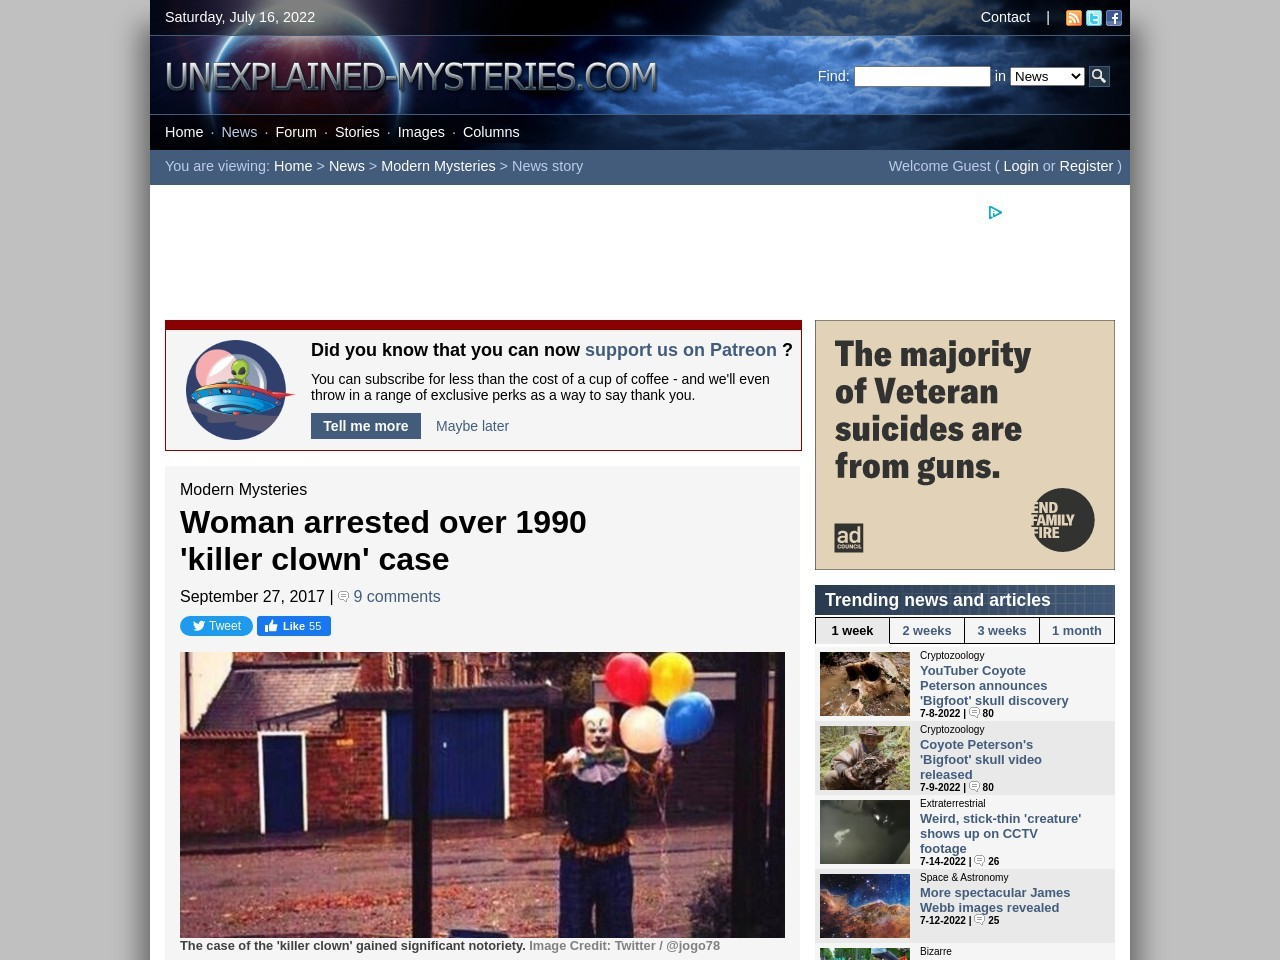 Woman arrested over 1990 'killer clown' case